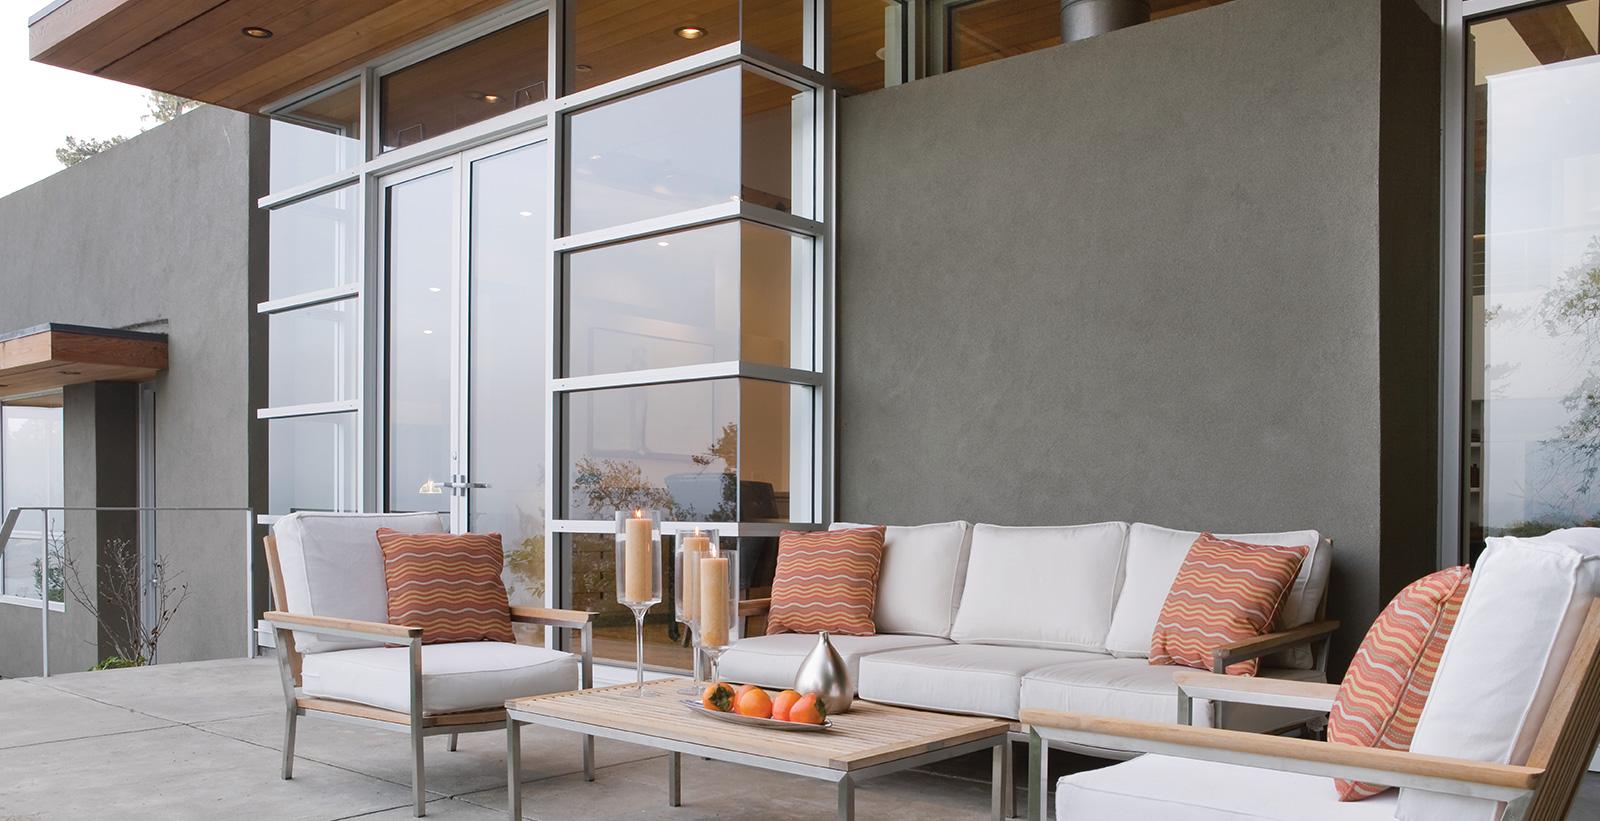 Modern Nook Exterior Patio House Exterior Gallery Behr